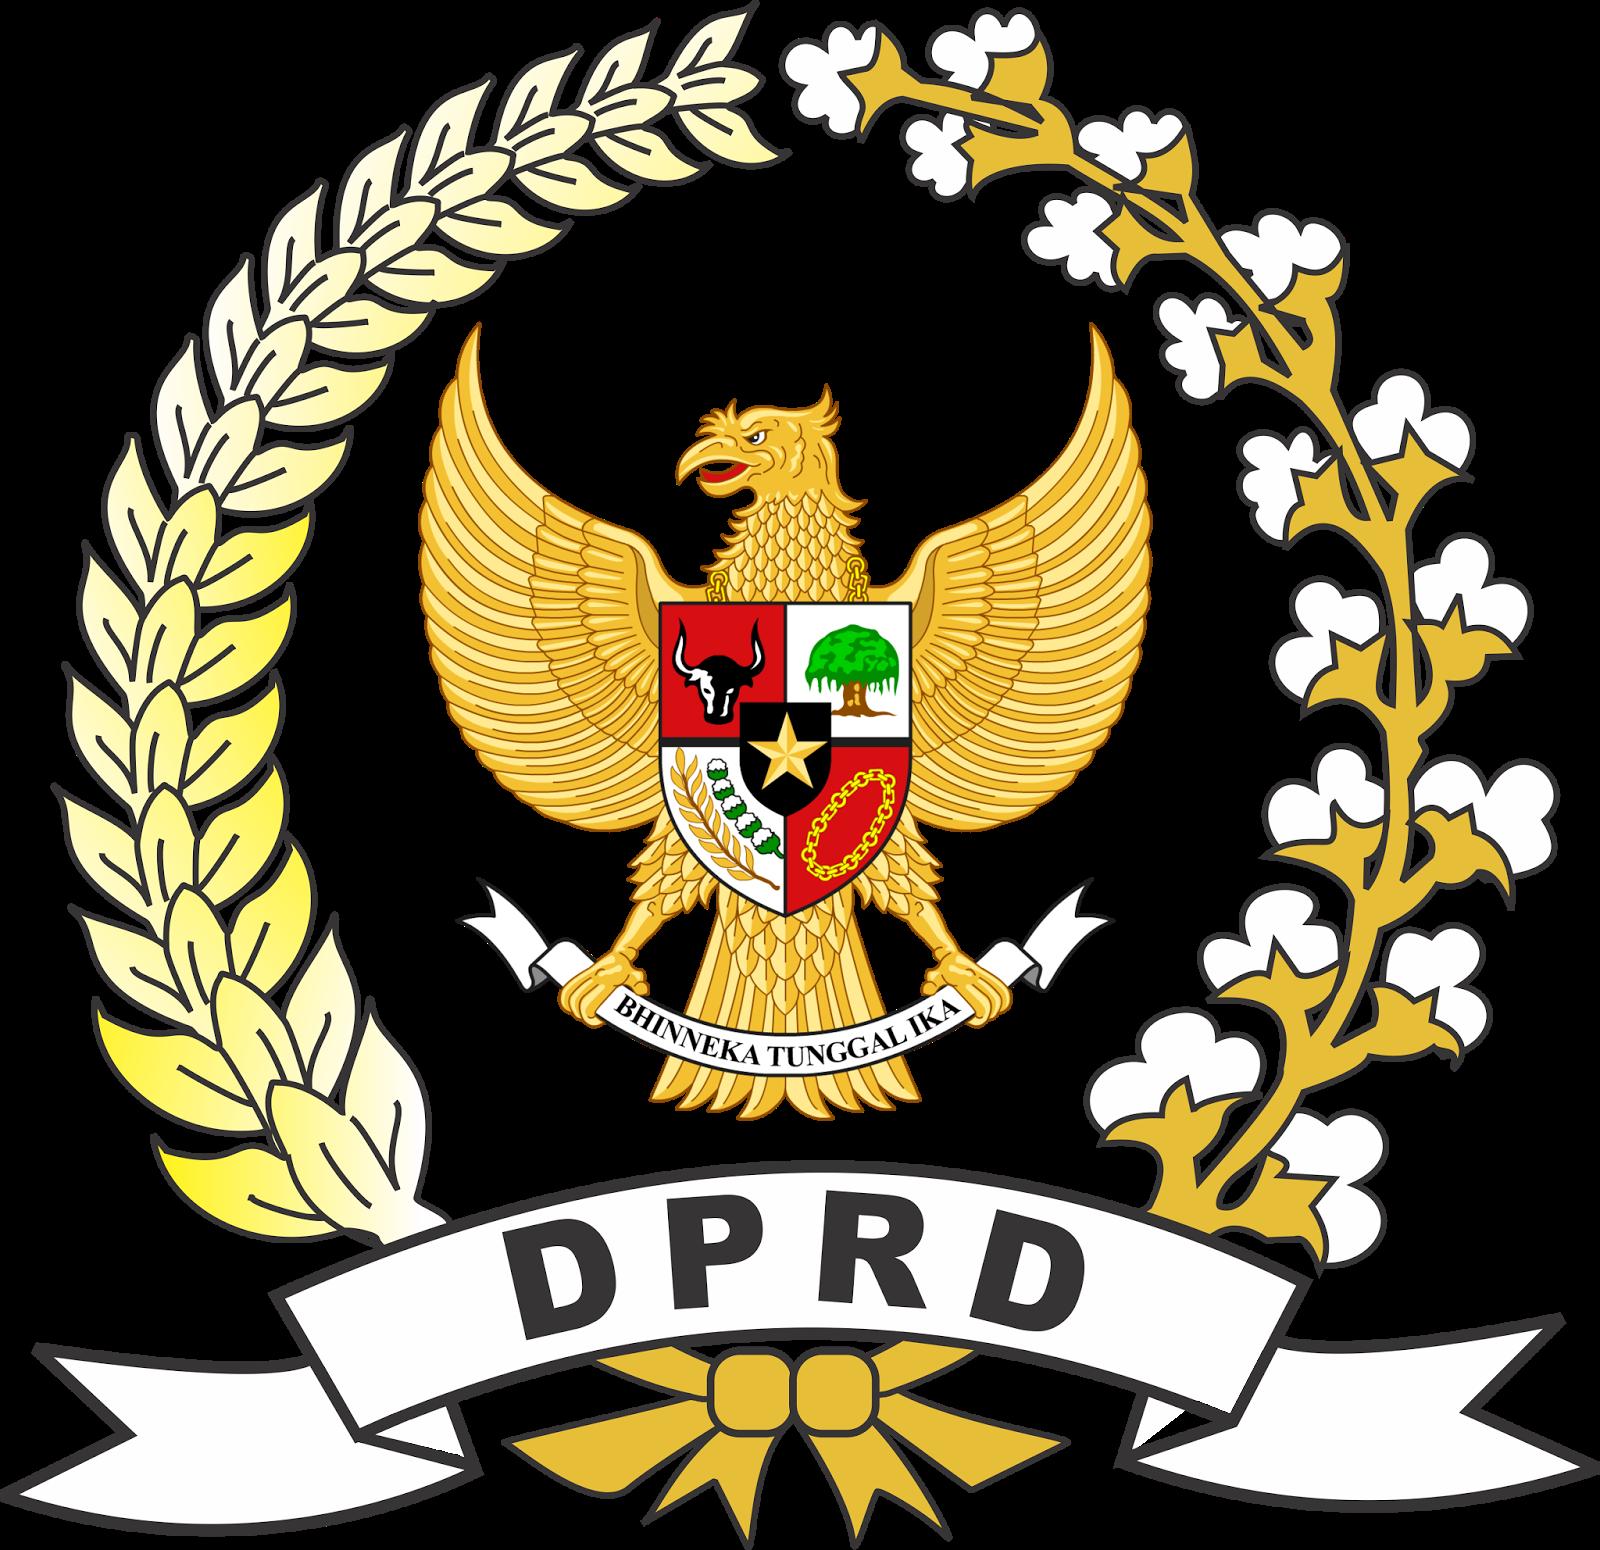 Anggota Dprd Kota Padang Panjang Periode 2019 2024 Resmi Dilantik Beritalima Com